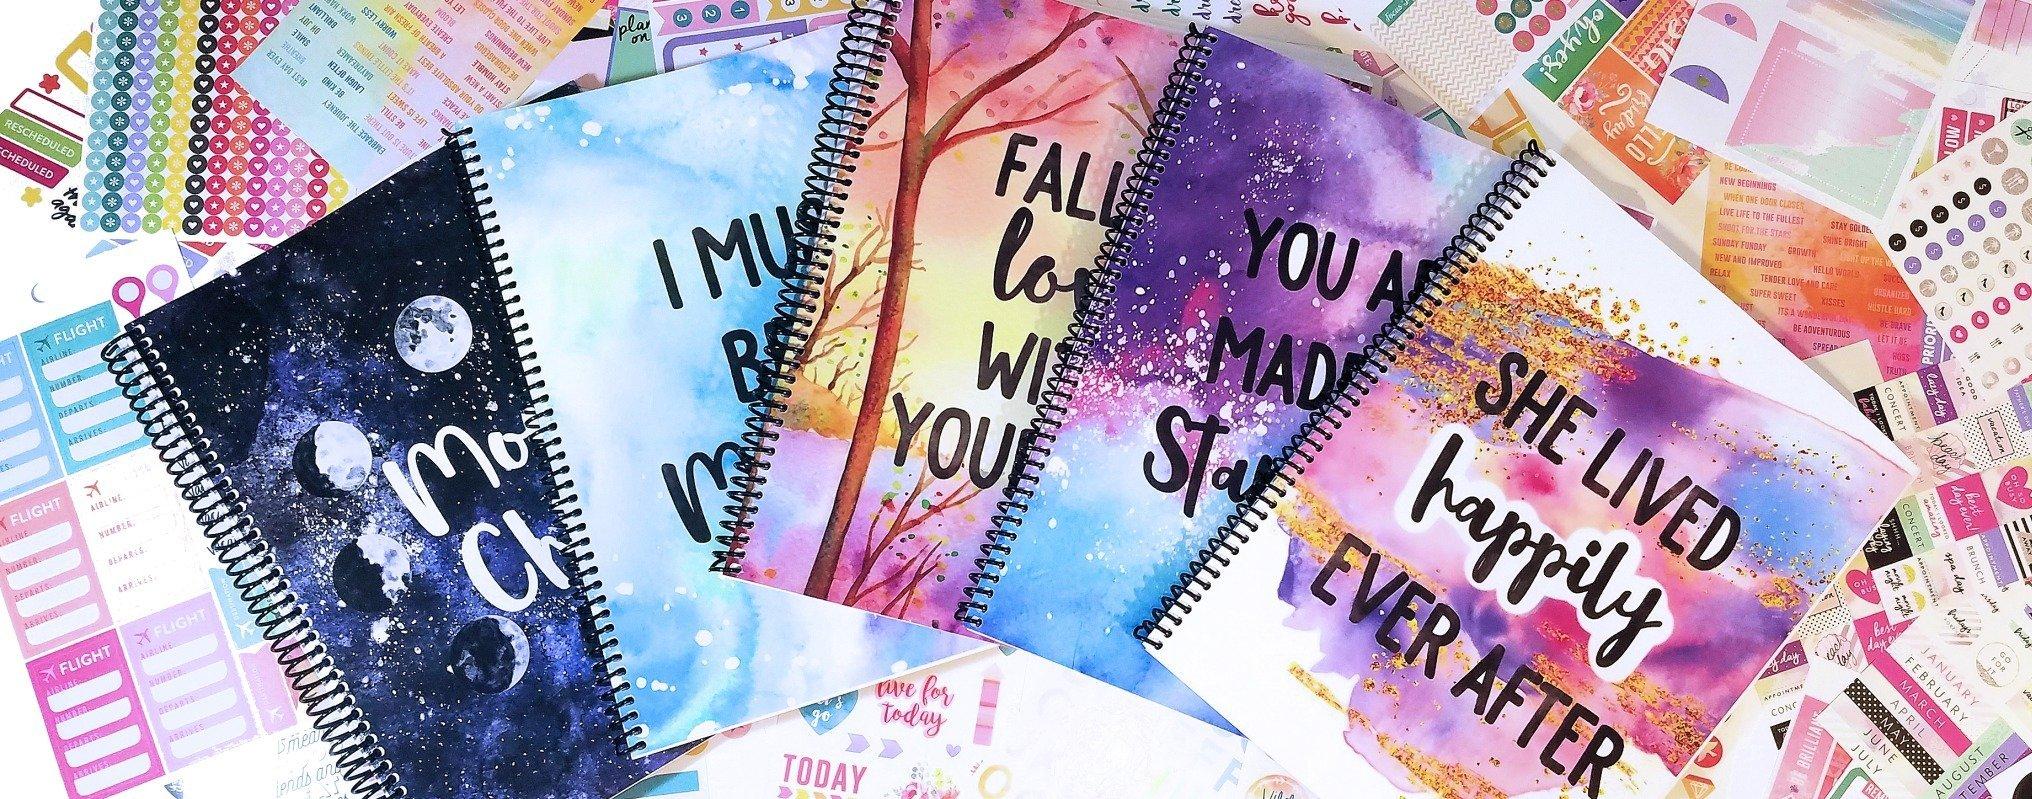 self-love workbook planner